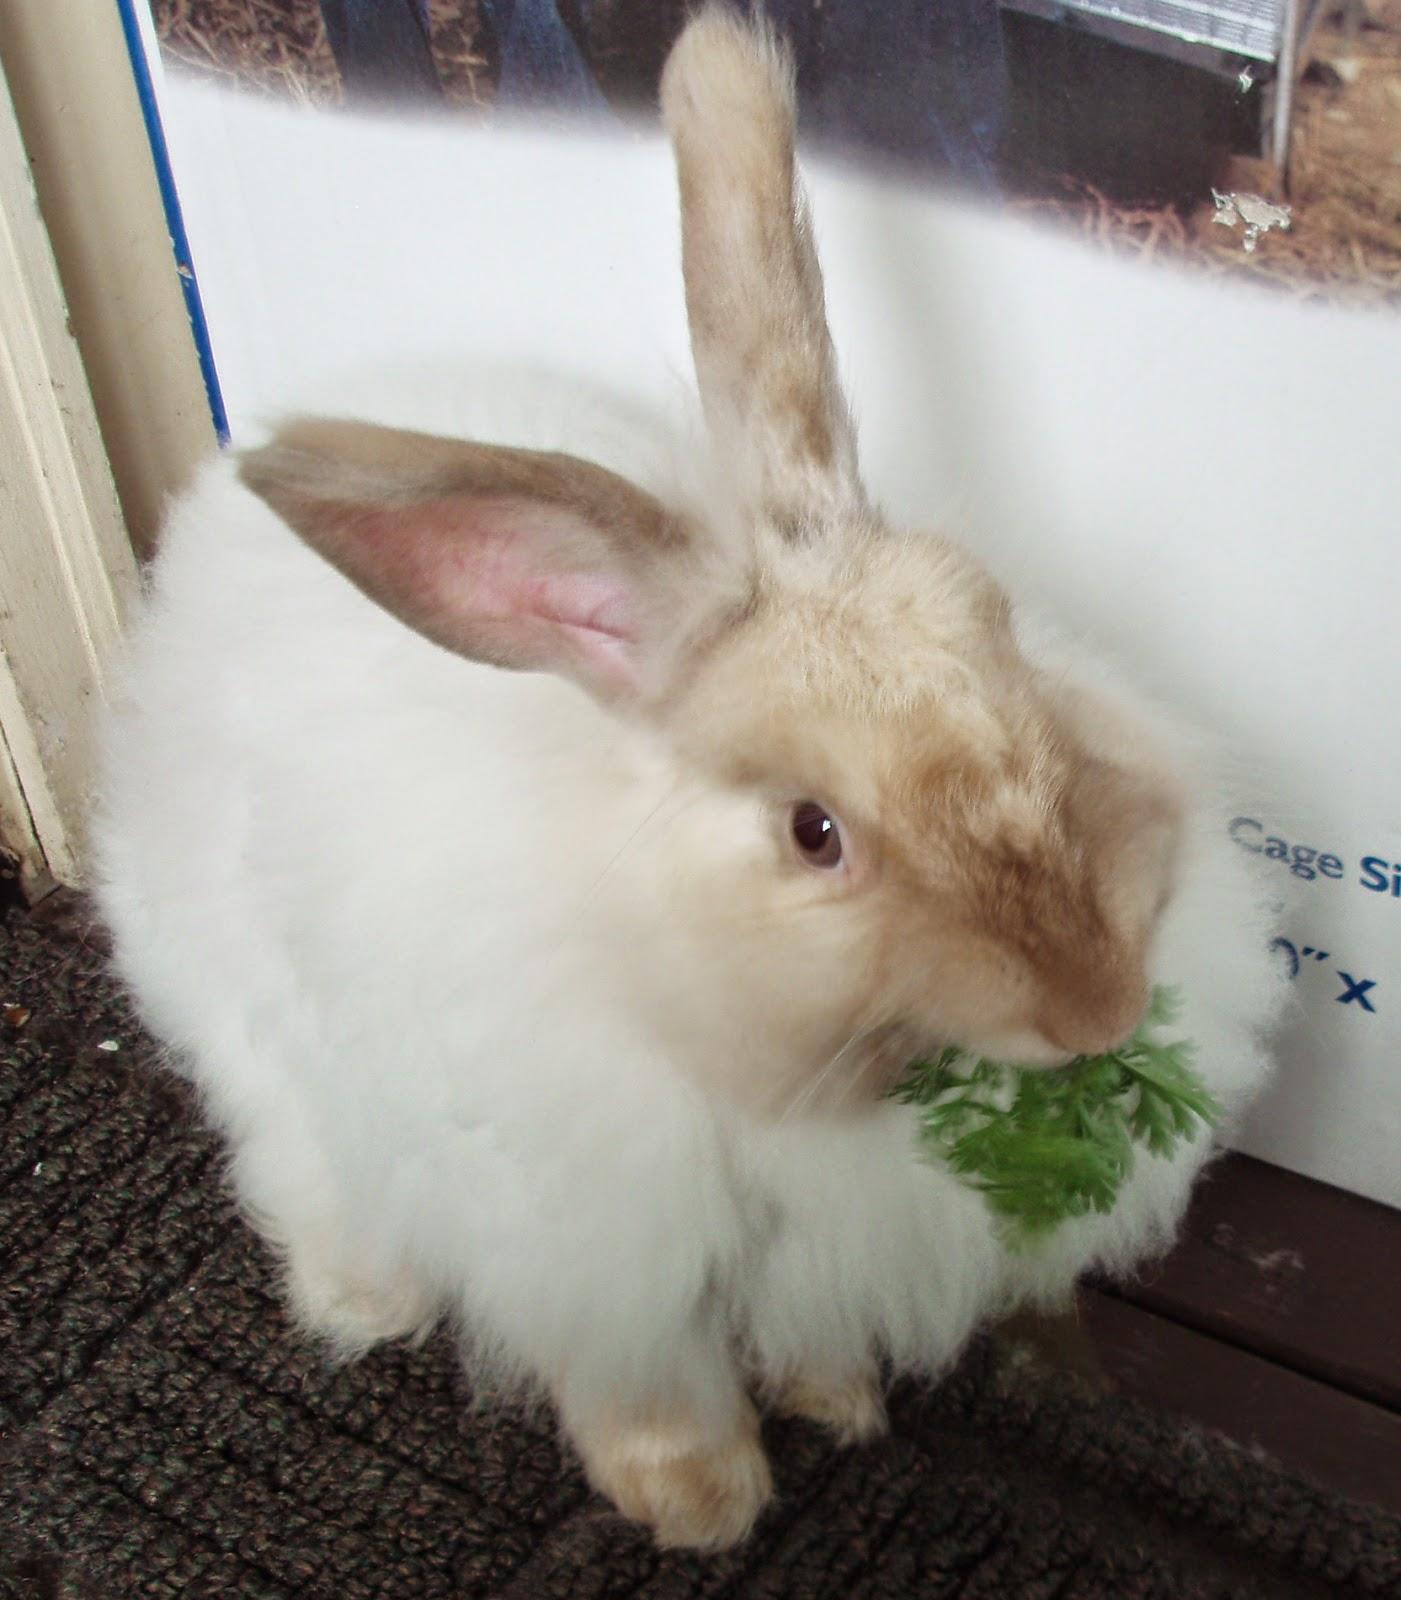 merawat kelinci, memelihara kelinci, kelinci sakit